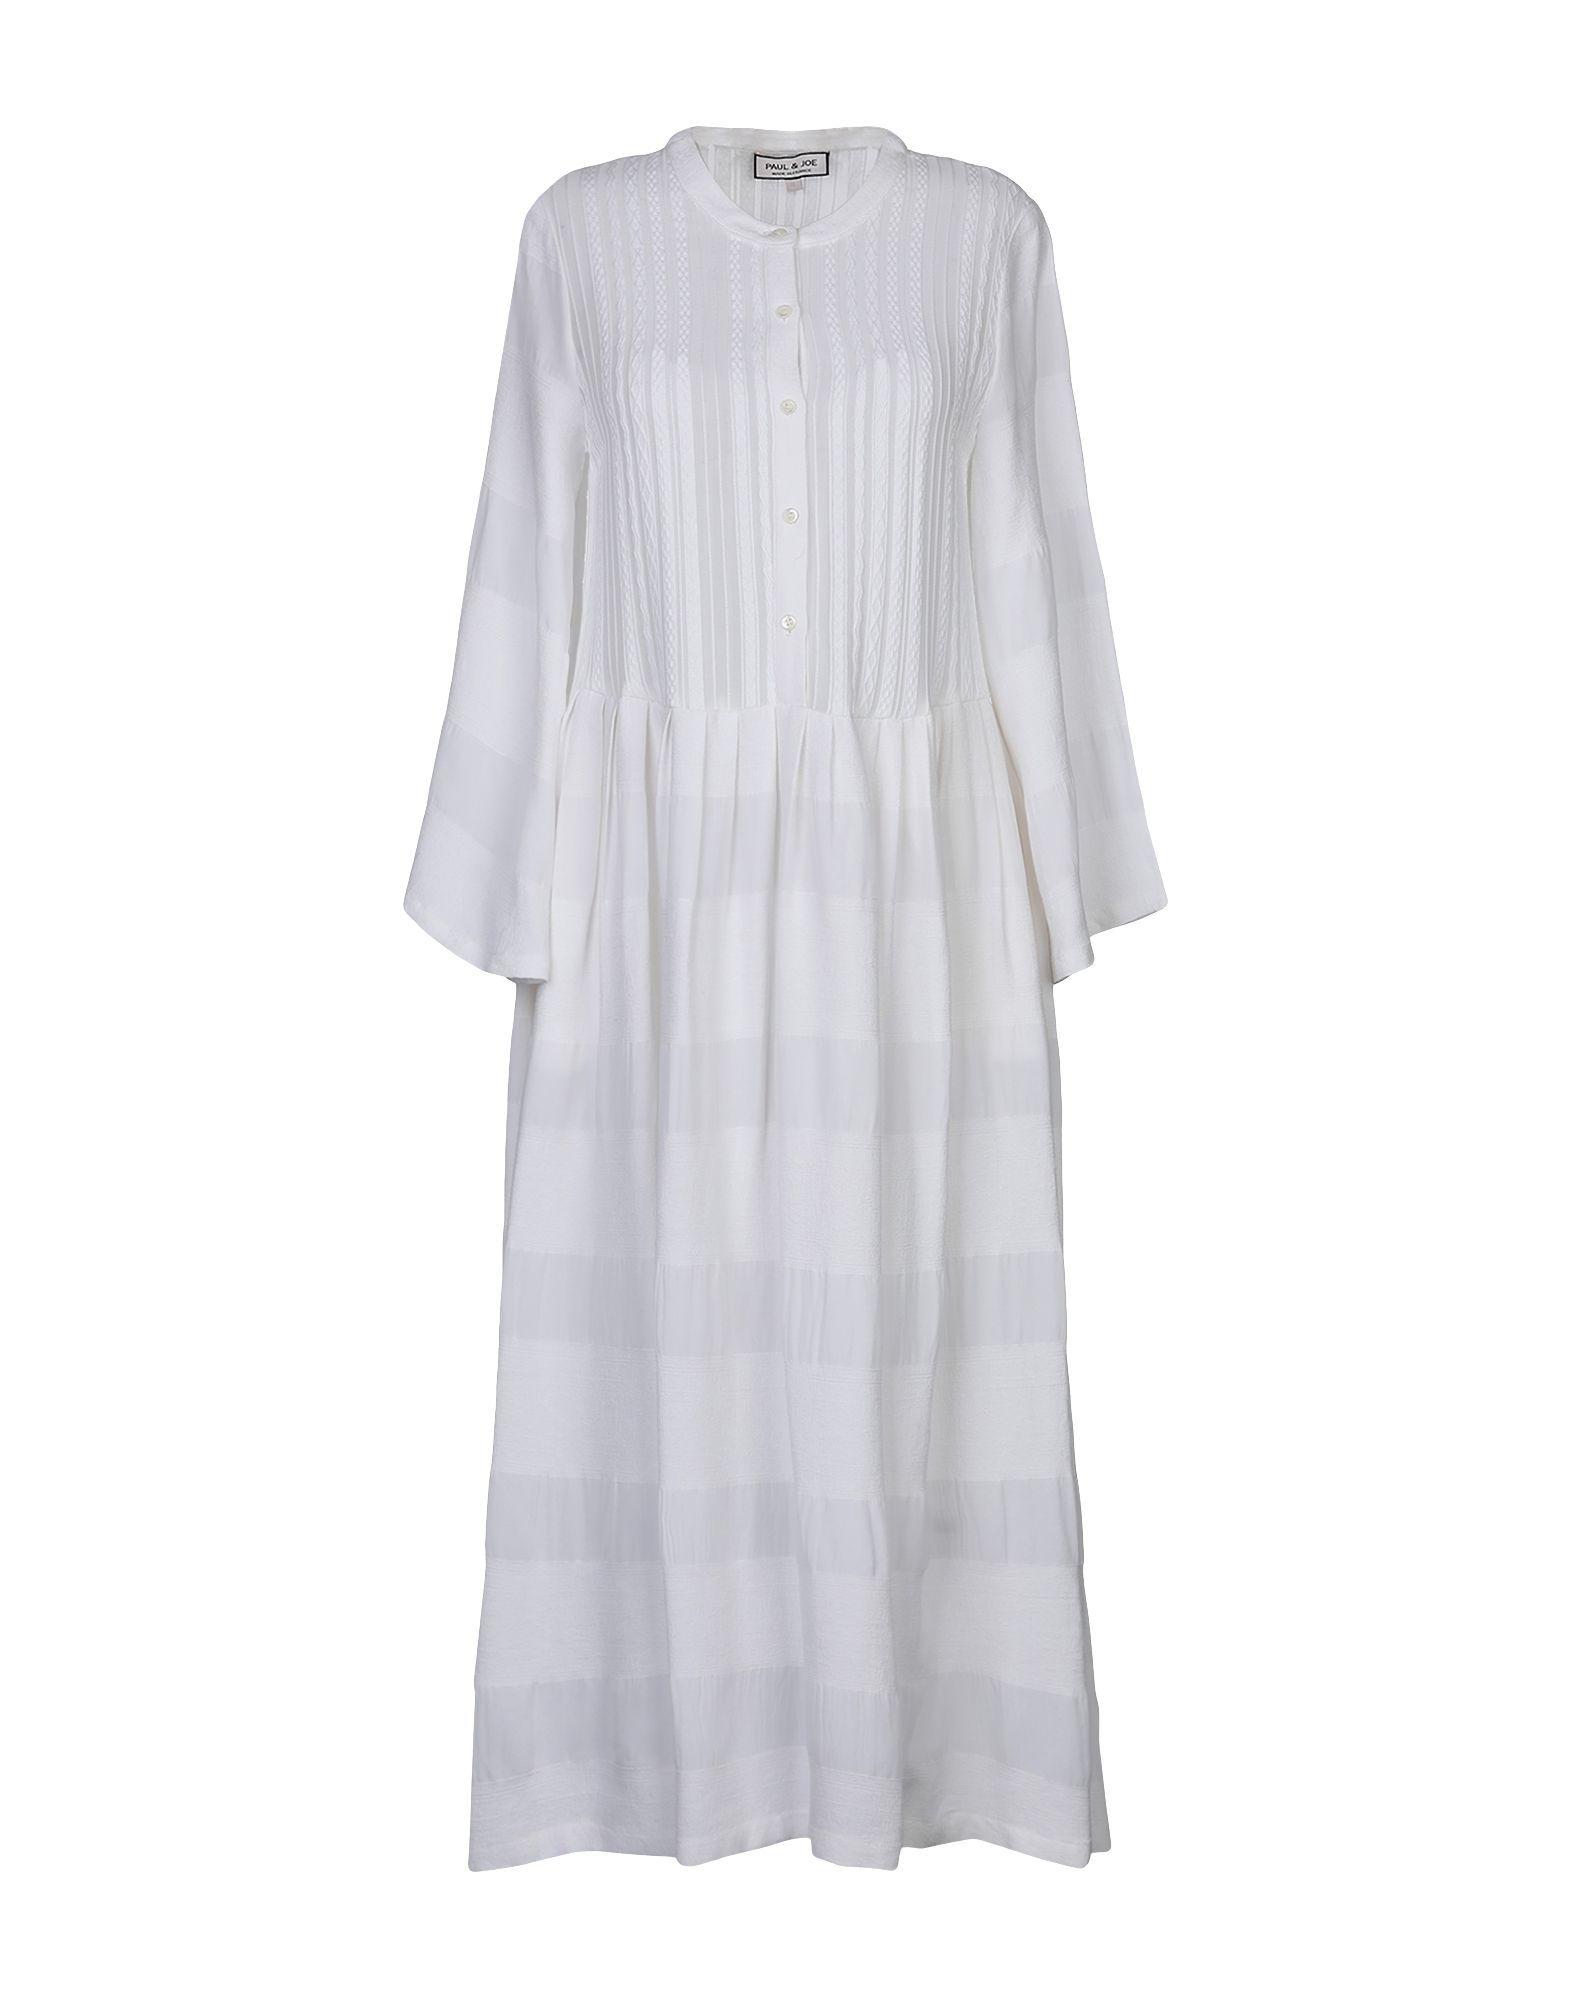 Paul & Joe White Cotton Shirt Dress